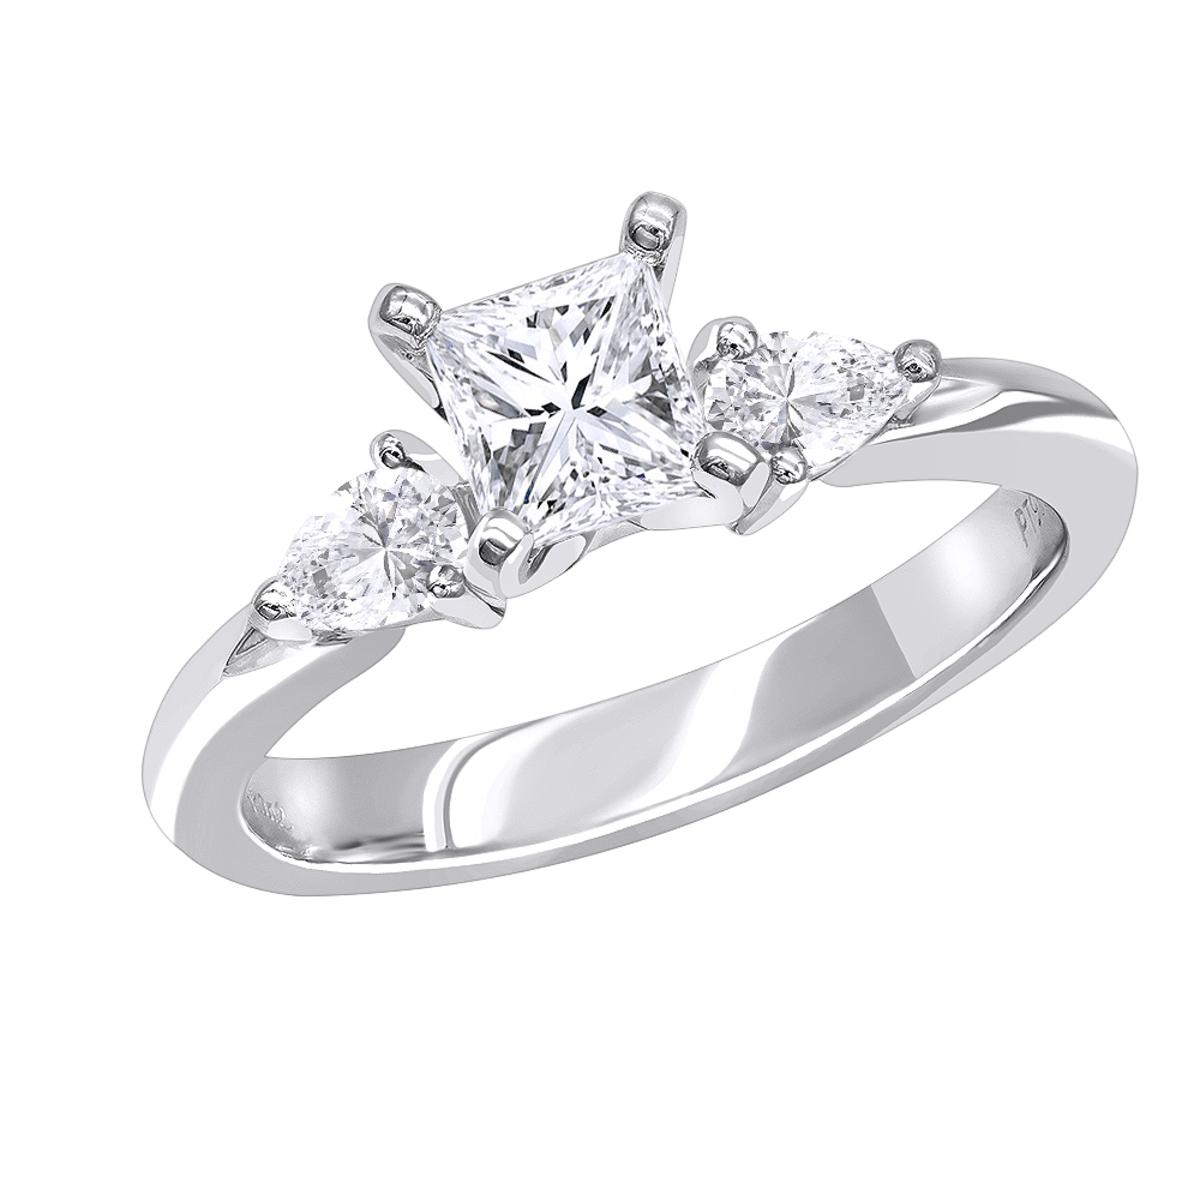 3 Stone Rings: Platinum Princess cut and Pear Diamond Engagement Ring 0.87